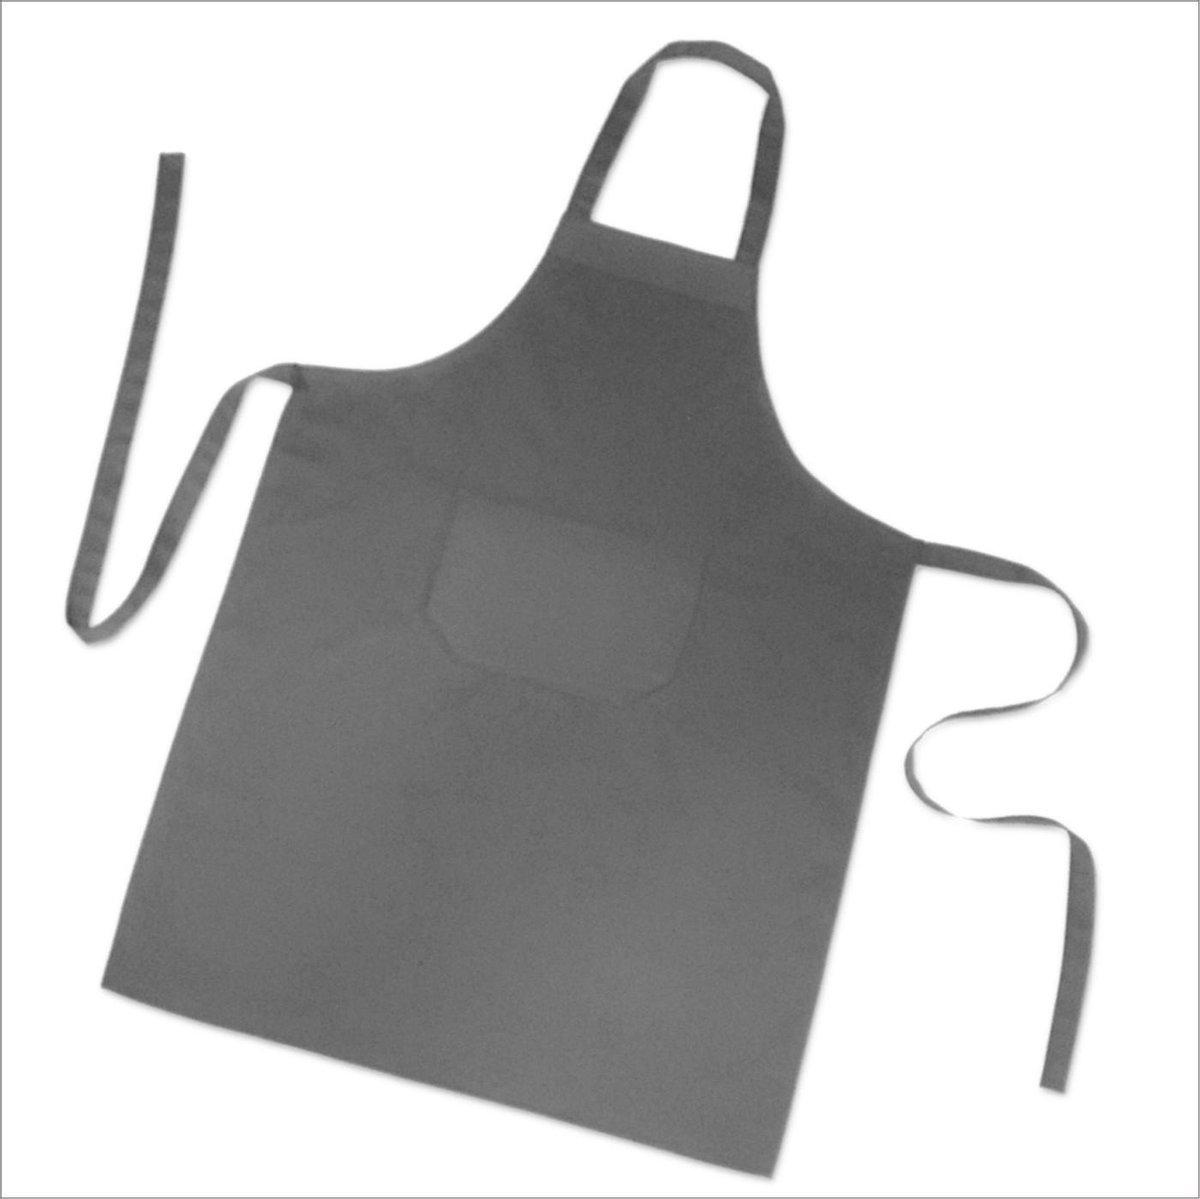 Homéé® Horeca suite Keukenschorten BBQ BIB Apron - donker grijs - 70x100 cm - 2 stuks